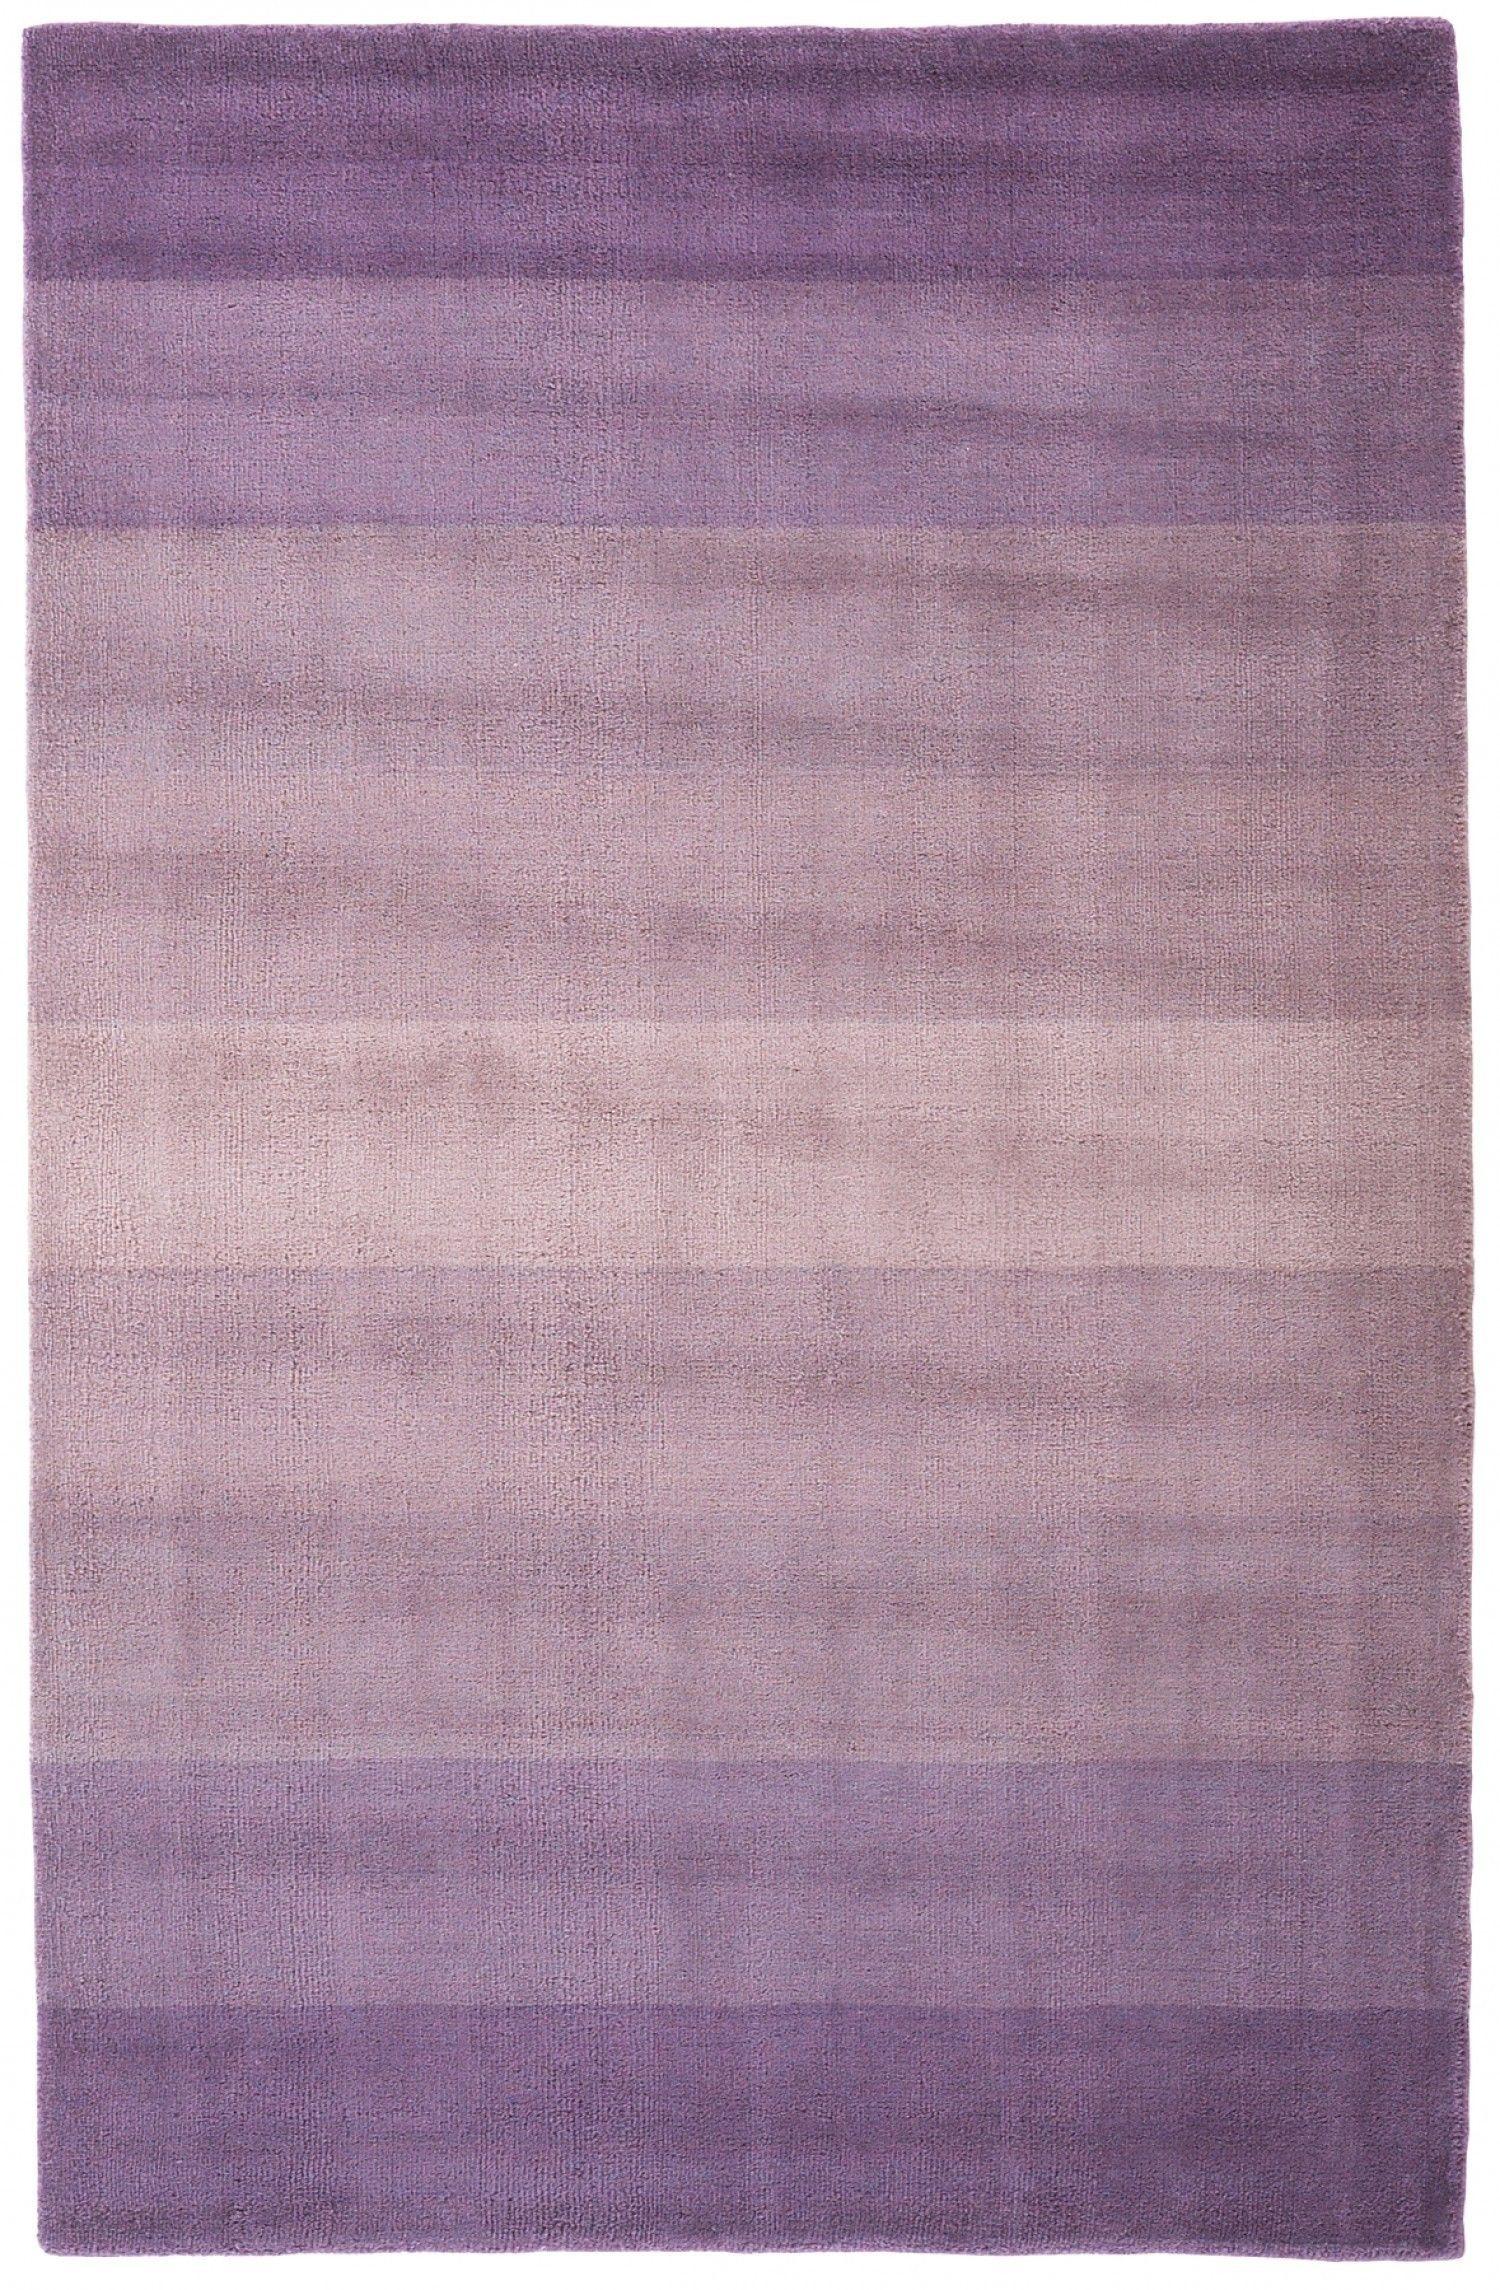 Marak Adamas Ad007 Purple Light To Dark Area Rug